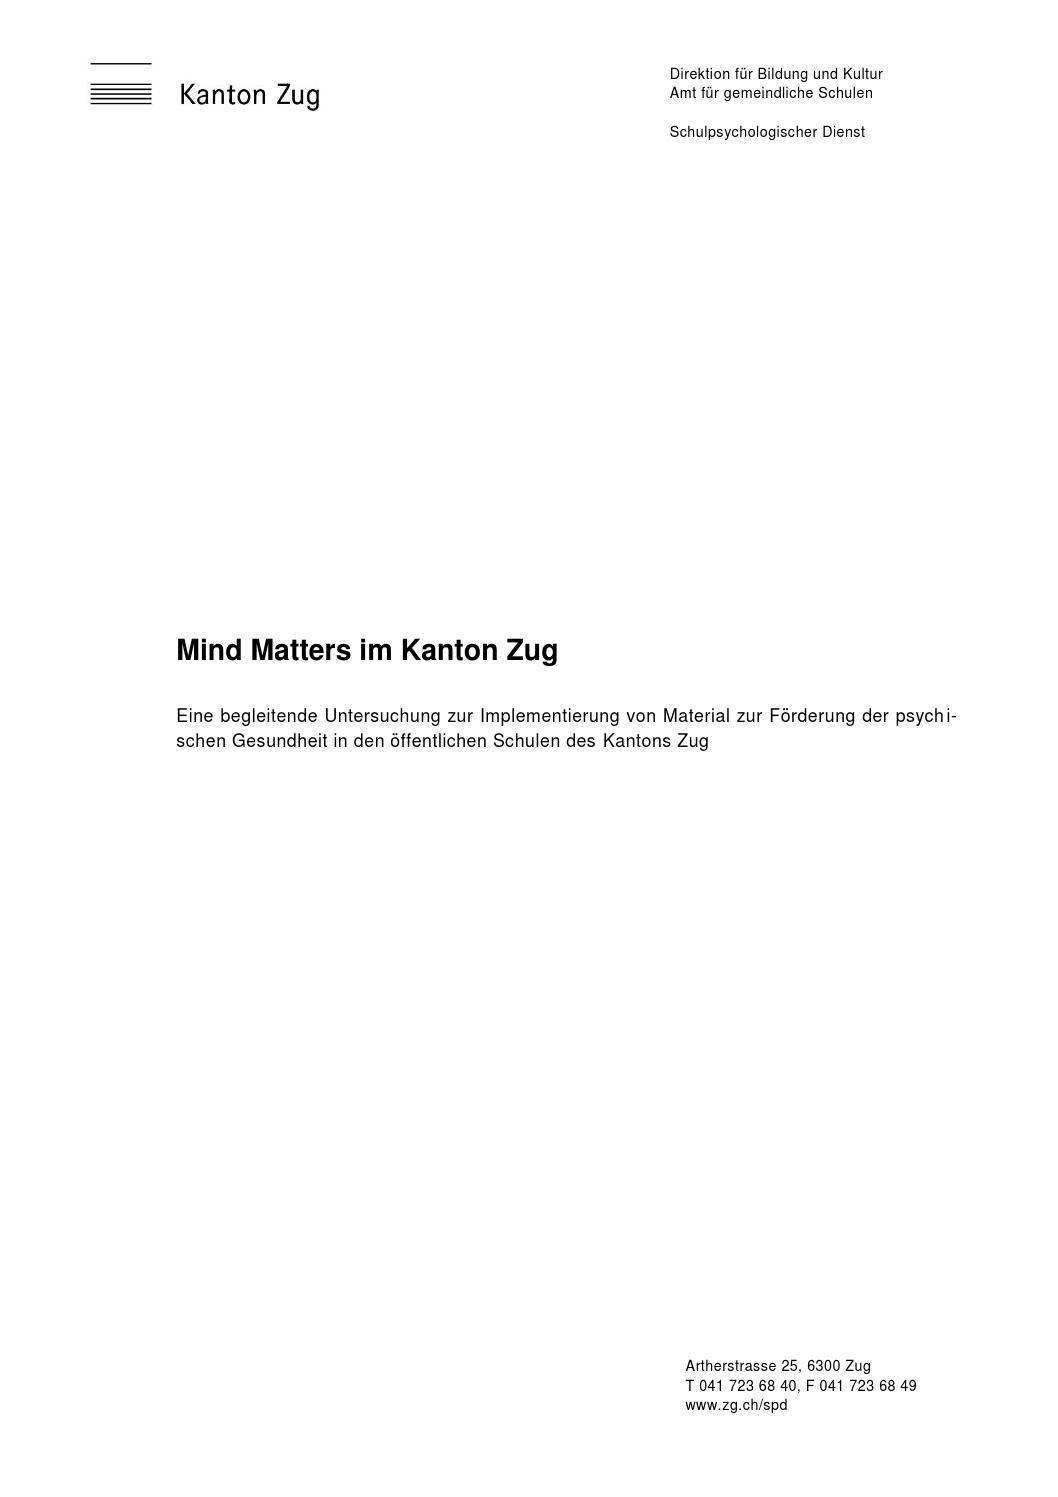 MindMatters im Kanton Zug by PAX P4X - issuu